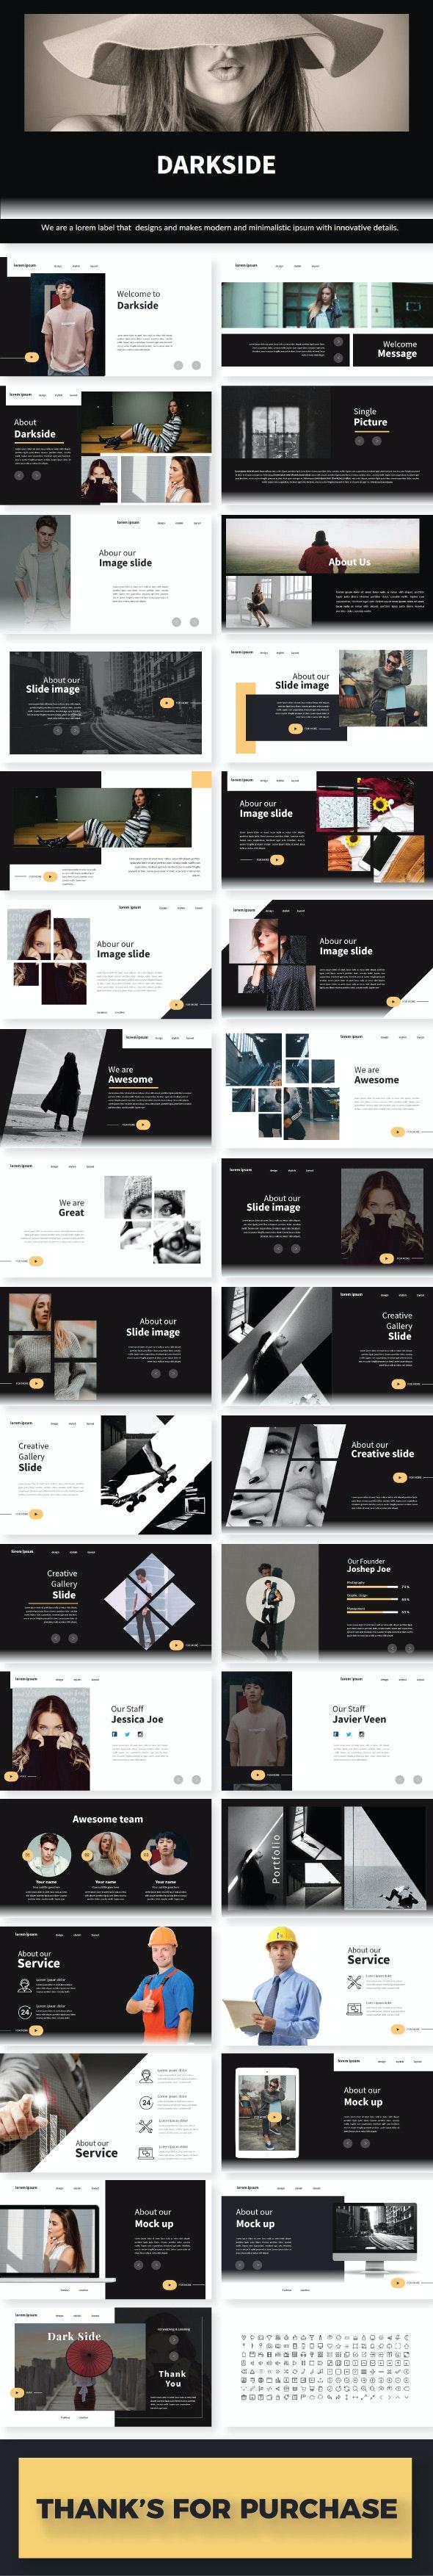 DarkSide Presentation Template - Creative PowerPoint Templates